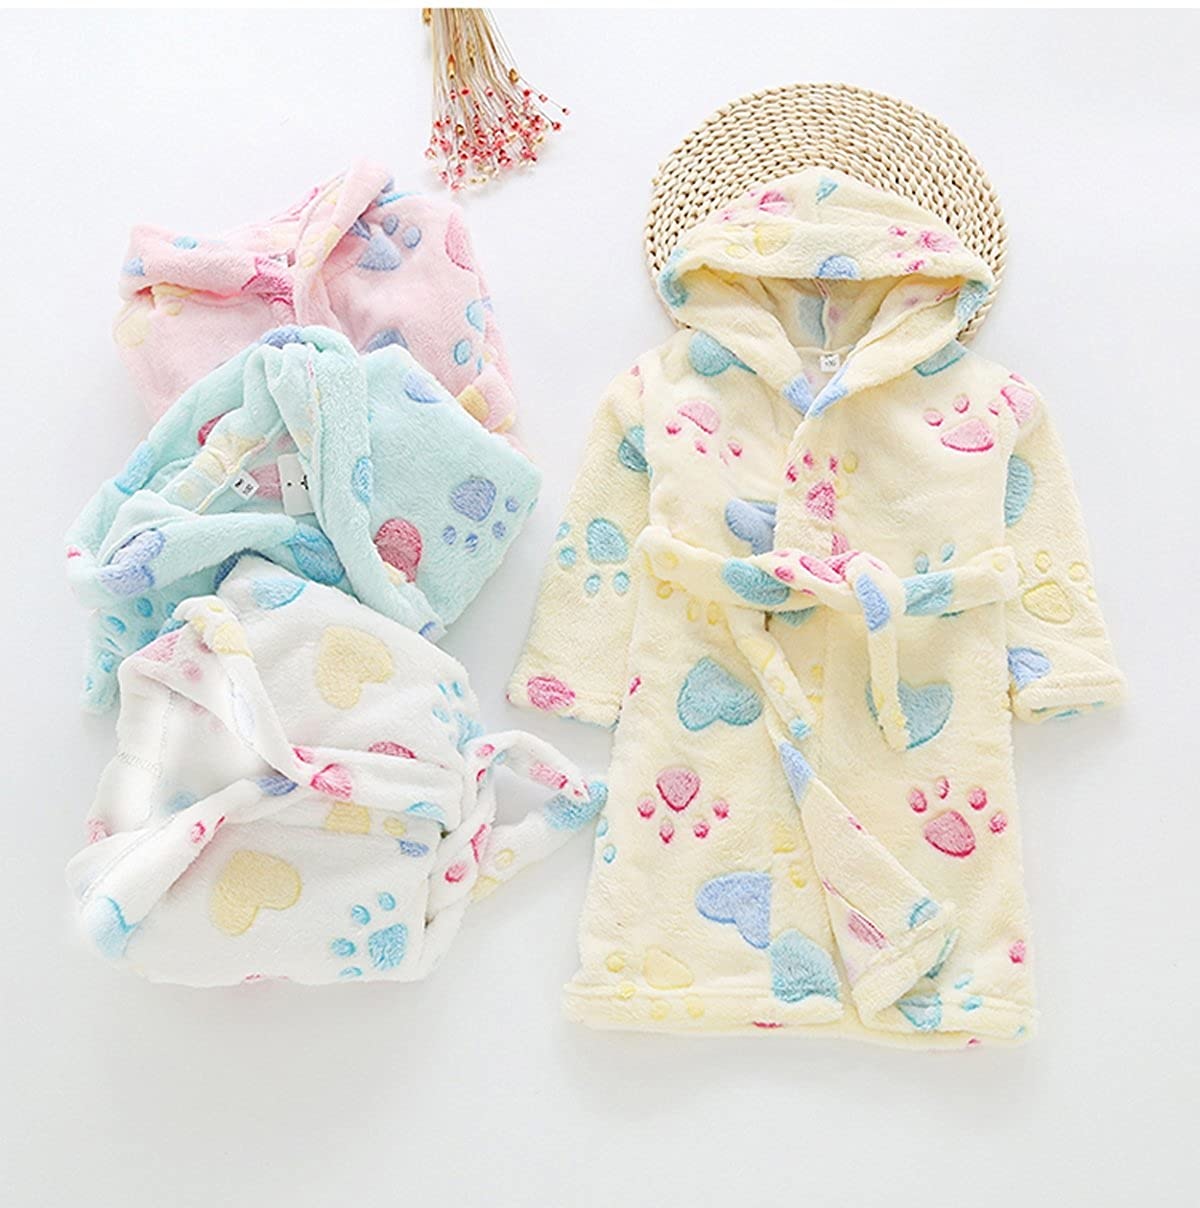 TOLLION Toddlers//Kids Hooded Robe Soft Fleece Bathrobe Boys Girls Pajamas Baby Sleepwear